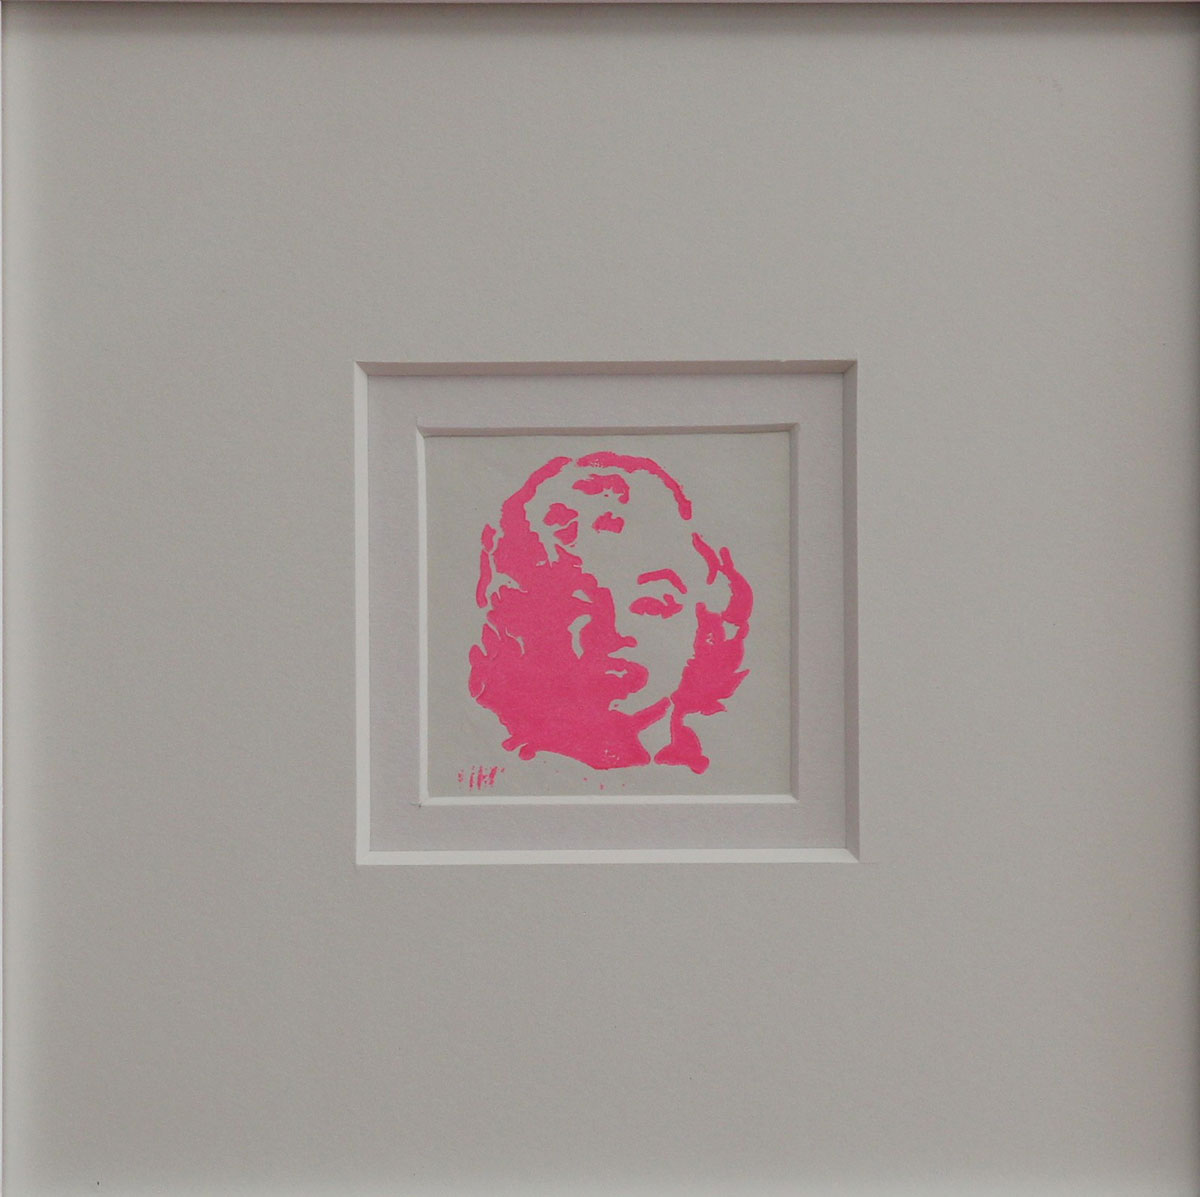 """MM ""Pink Linocut Framed Size: 11""x11"""